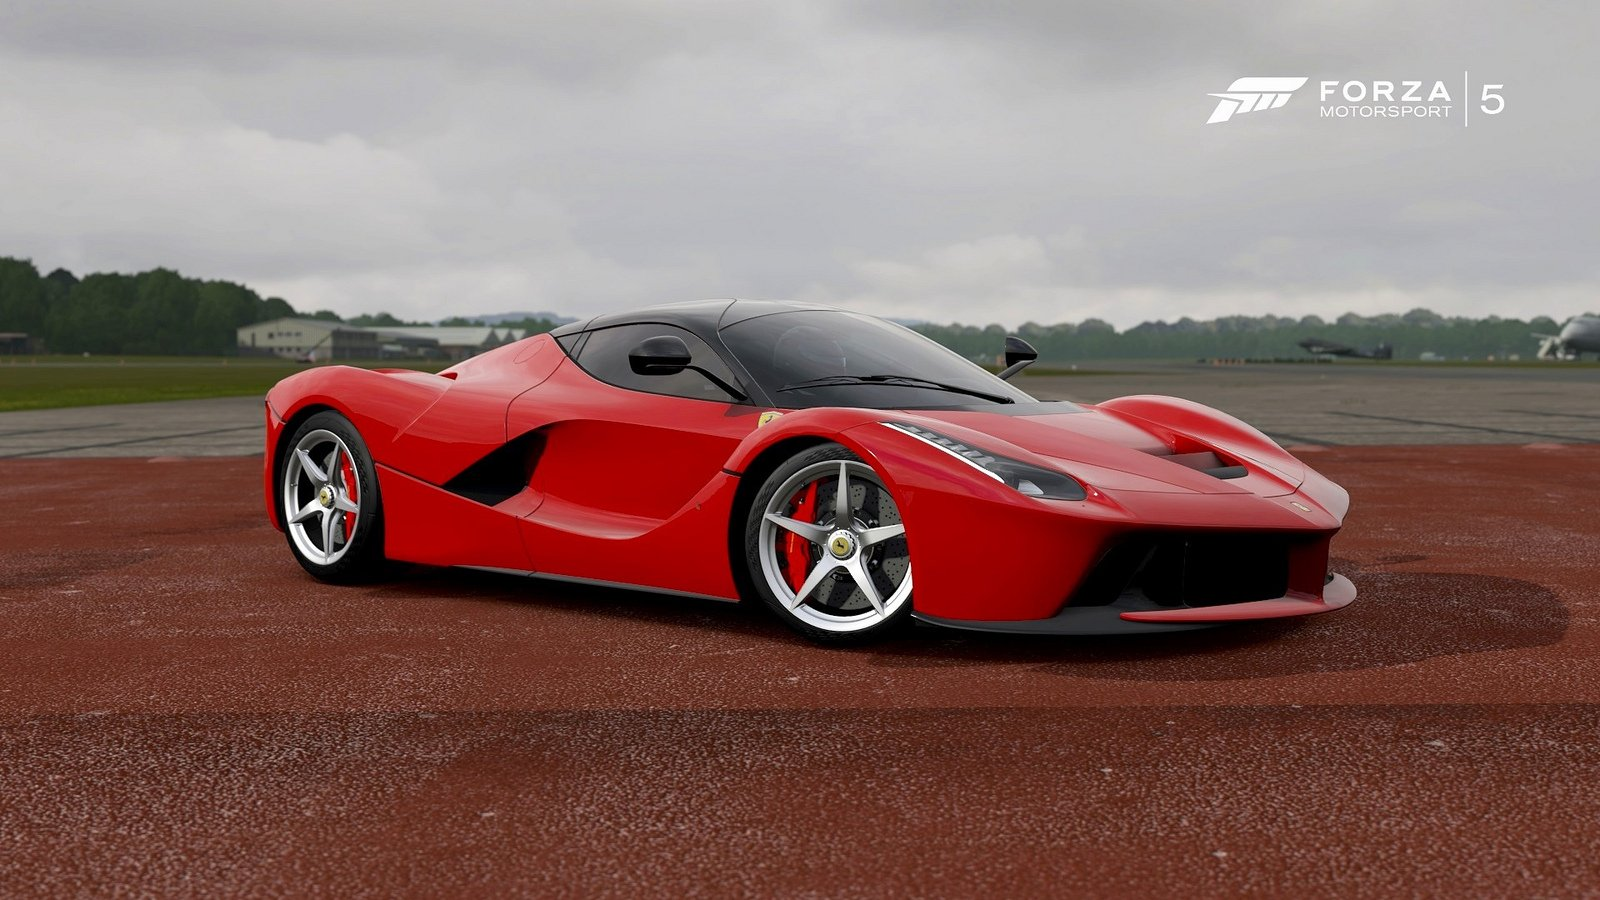 laferrari forza motorsport 5 cars videogames wallpaper background 1600x900